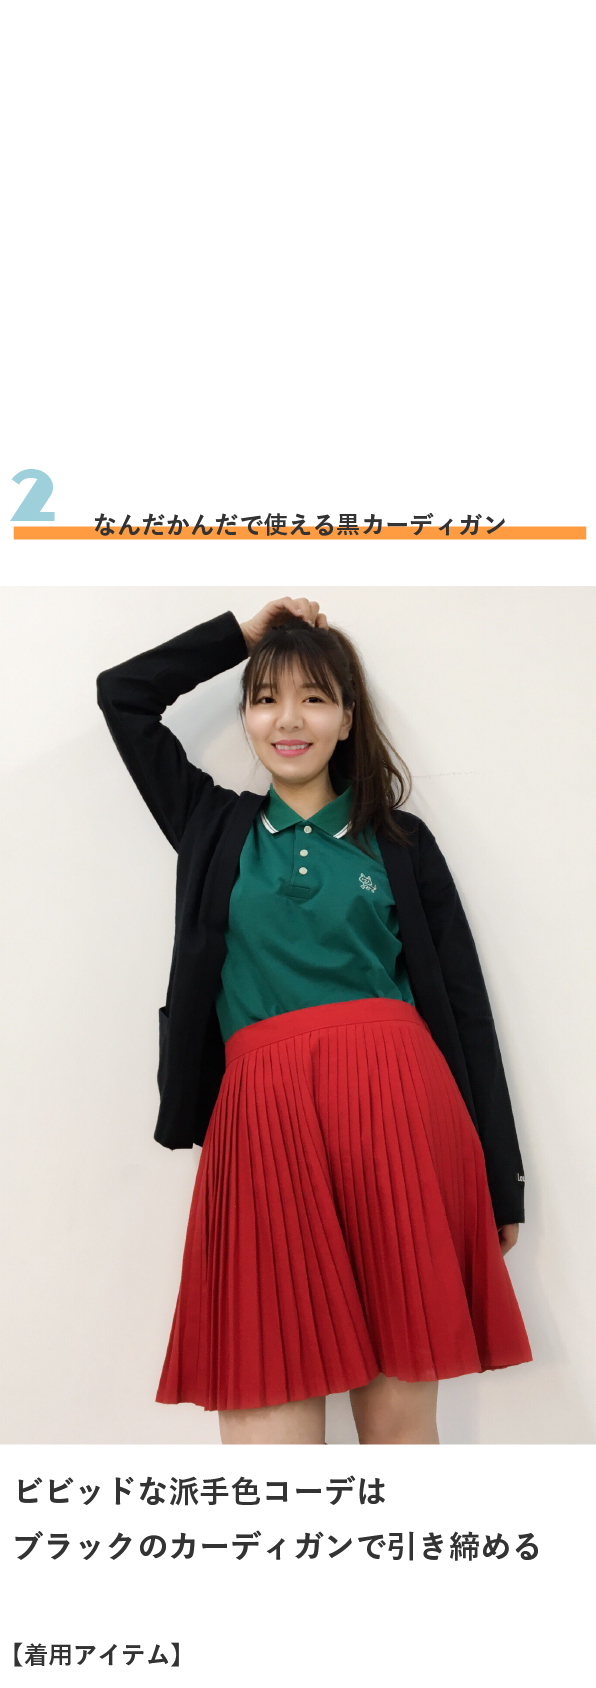 0303haori-02-596